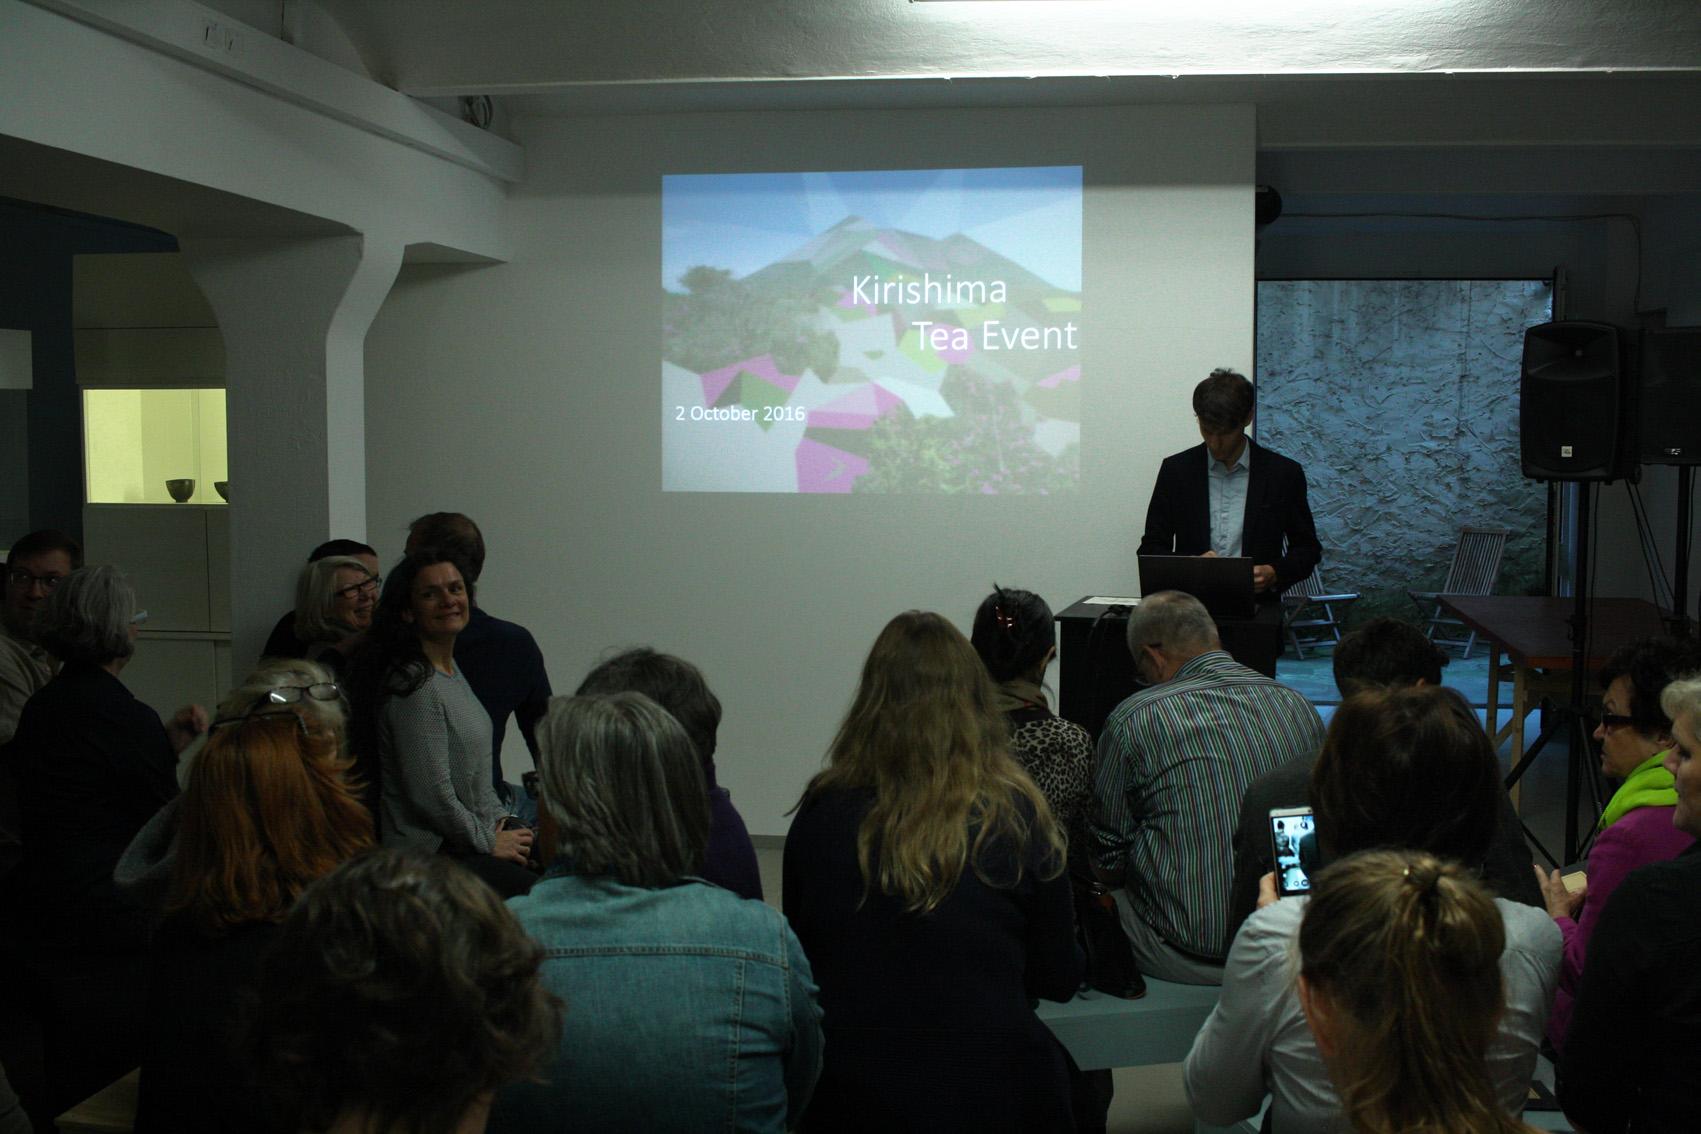 Präsentation beim diesjährigen Kirishima Tee Event